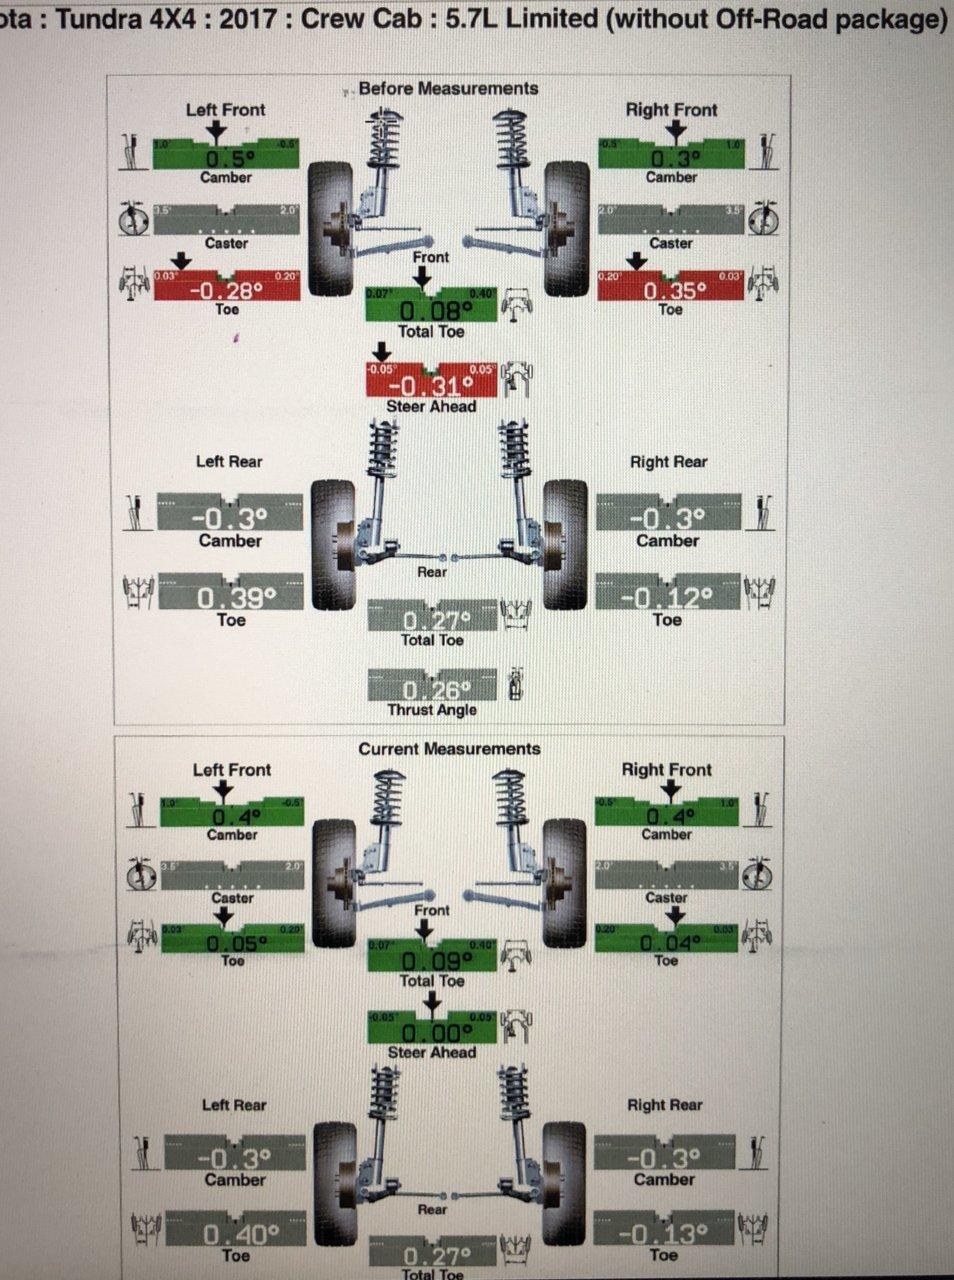 A3FD67C7-CB03-448A-B34C-CDE9A639F22F.jpg